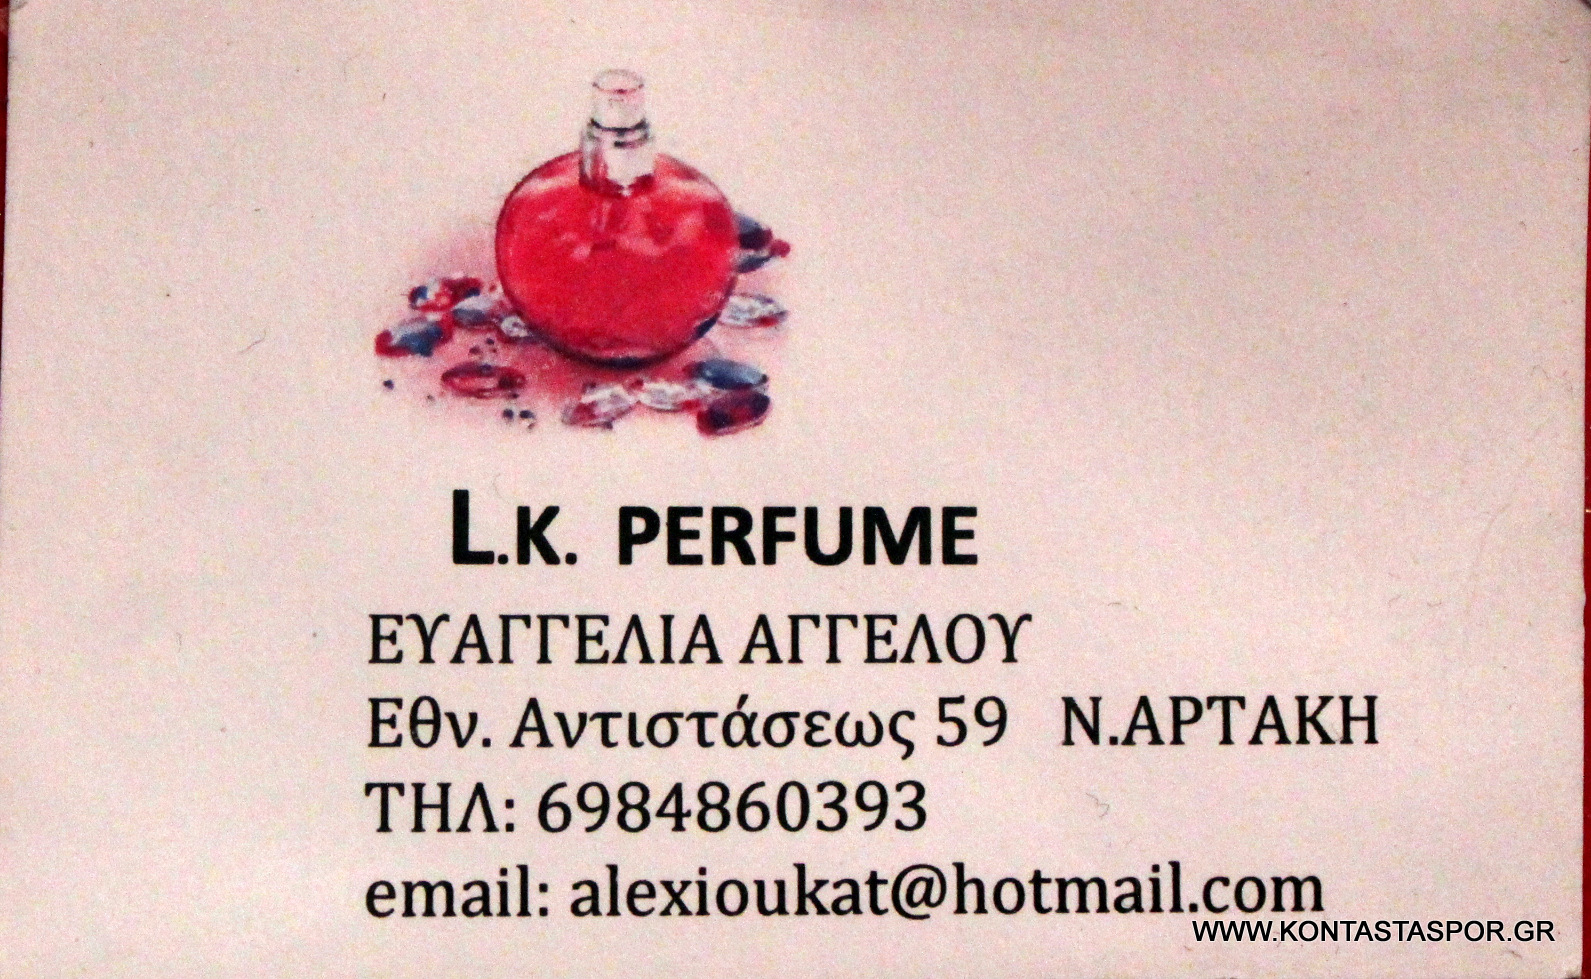 L.K PERFUME